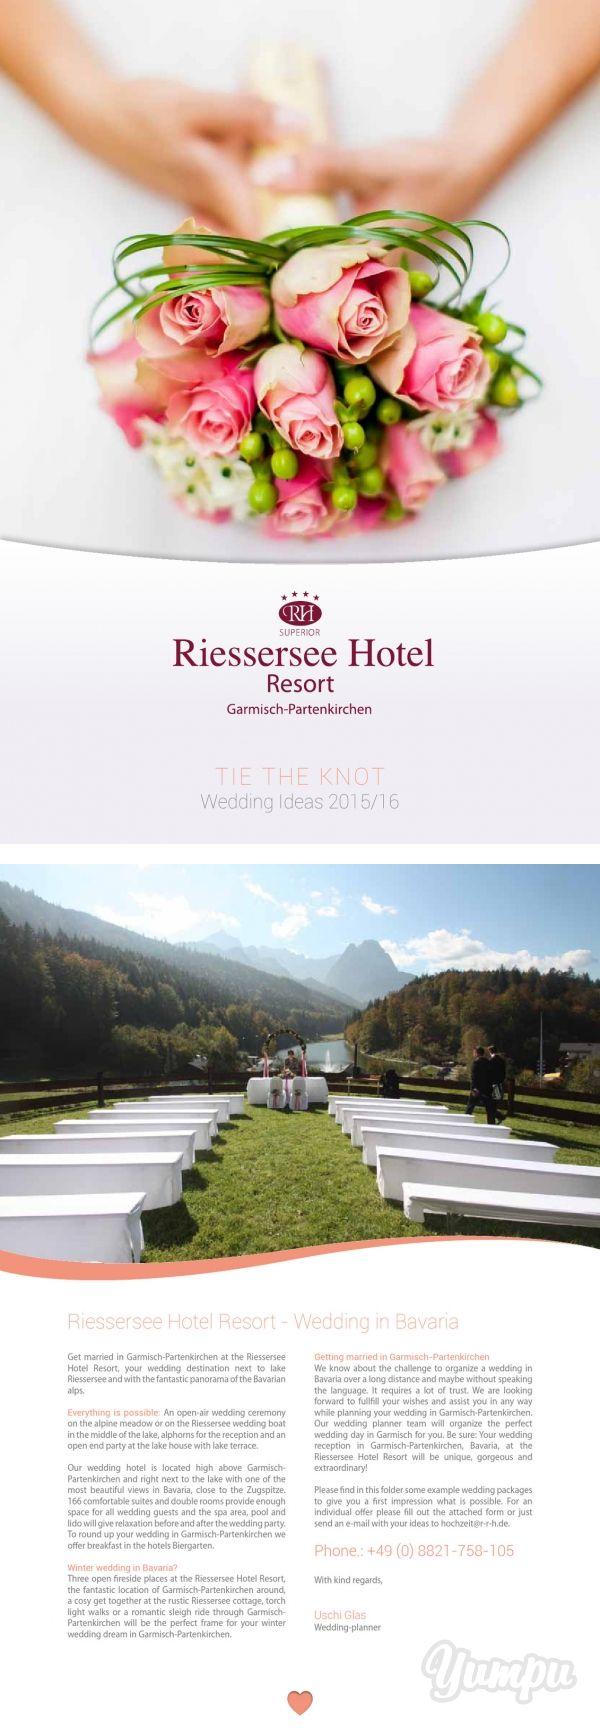 TIE THE KNOT - Magazine with 16 pages: Wedding in Bavaria, Garmisch-Partenkirchen, Riessersee Hotel Resort - Wedding ideas and packages